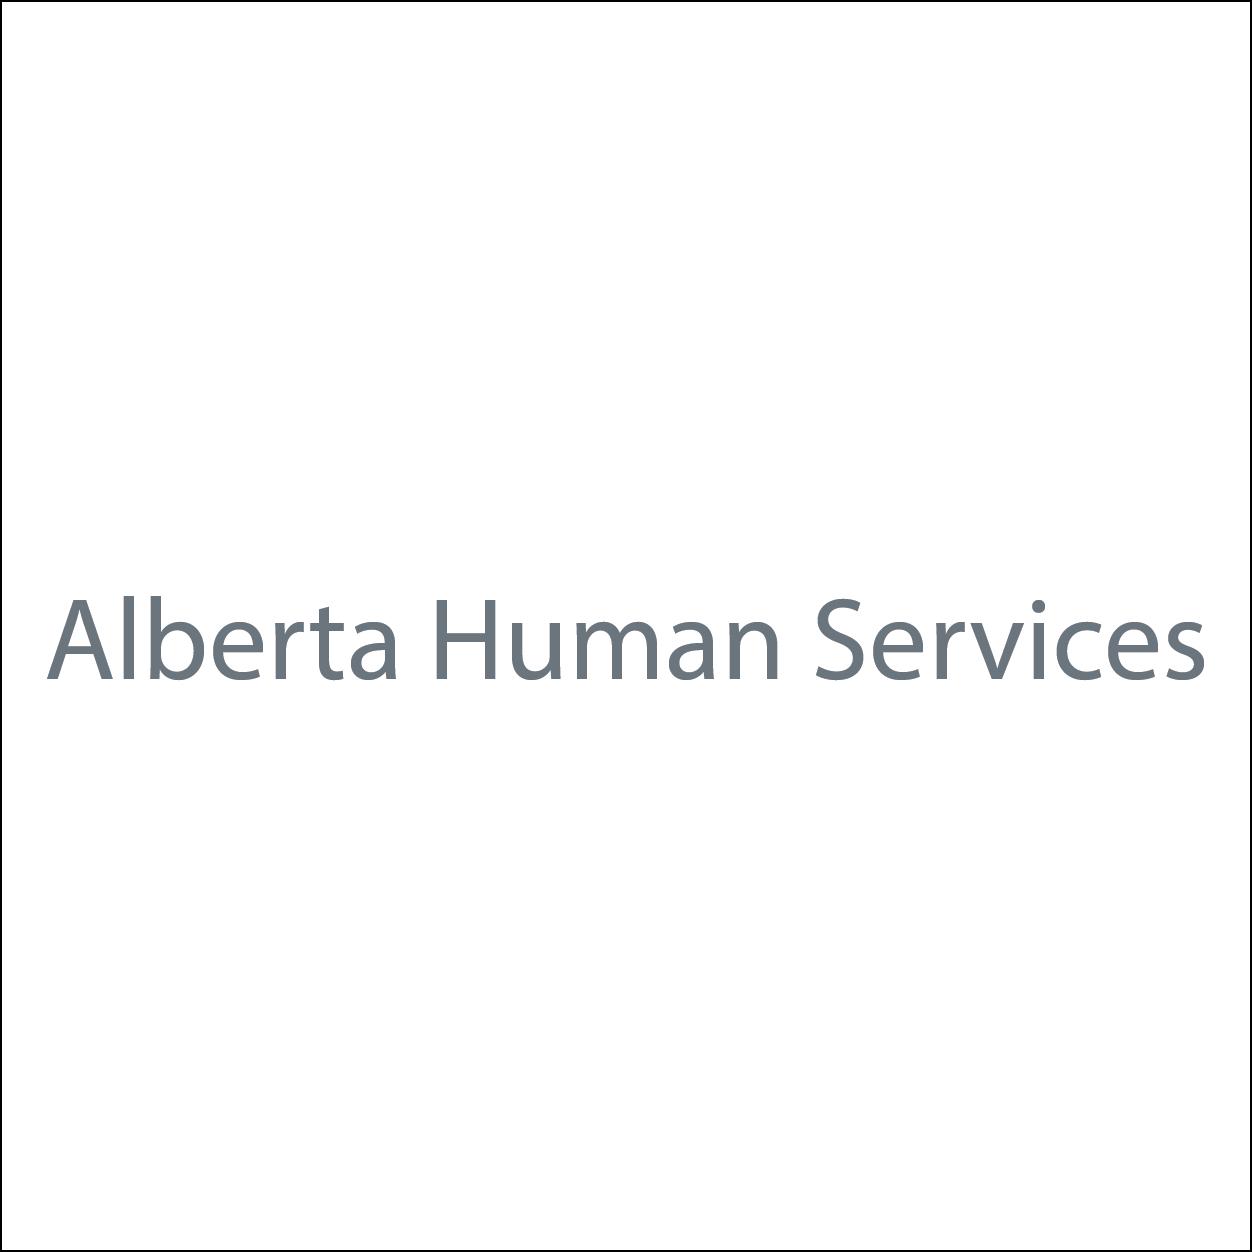 Alberta Human Services